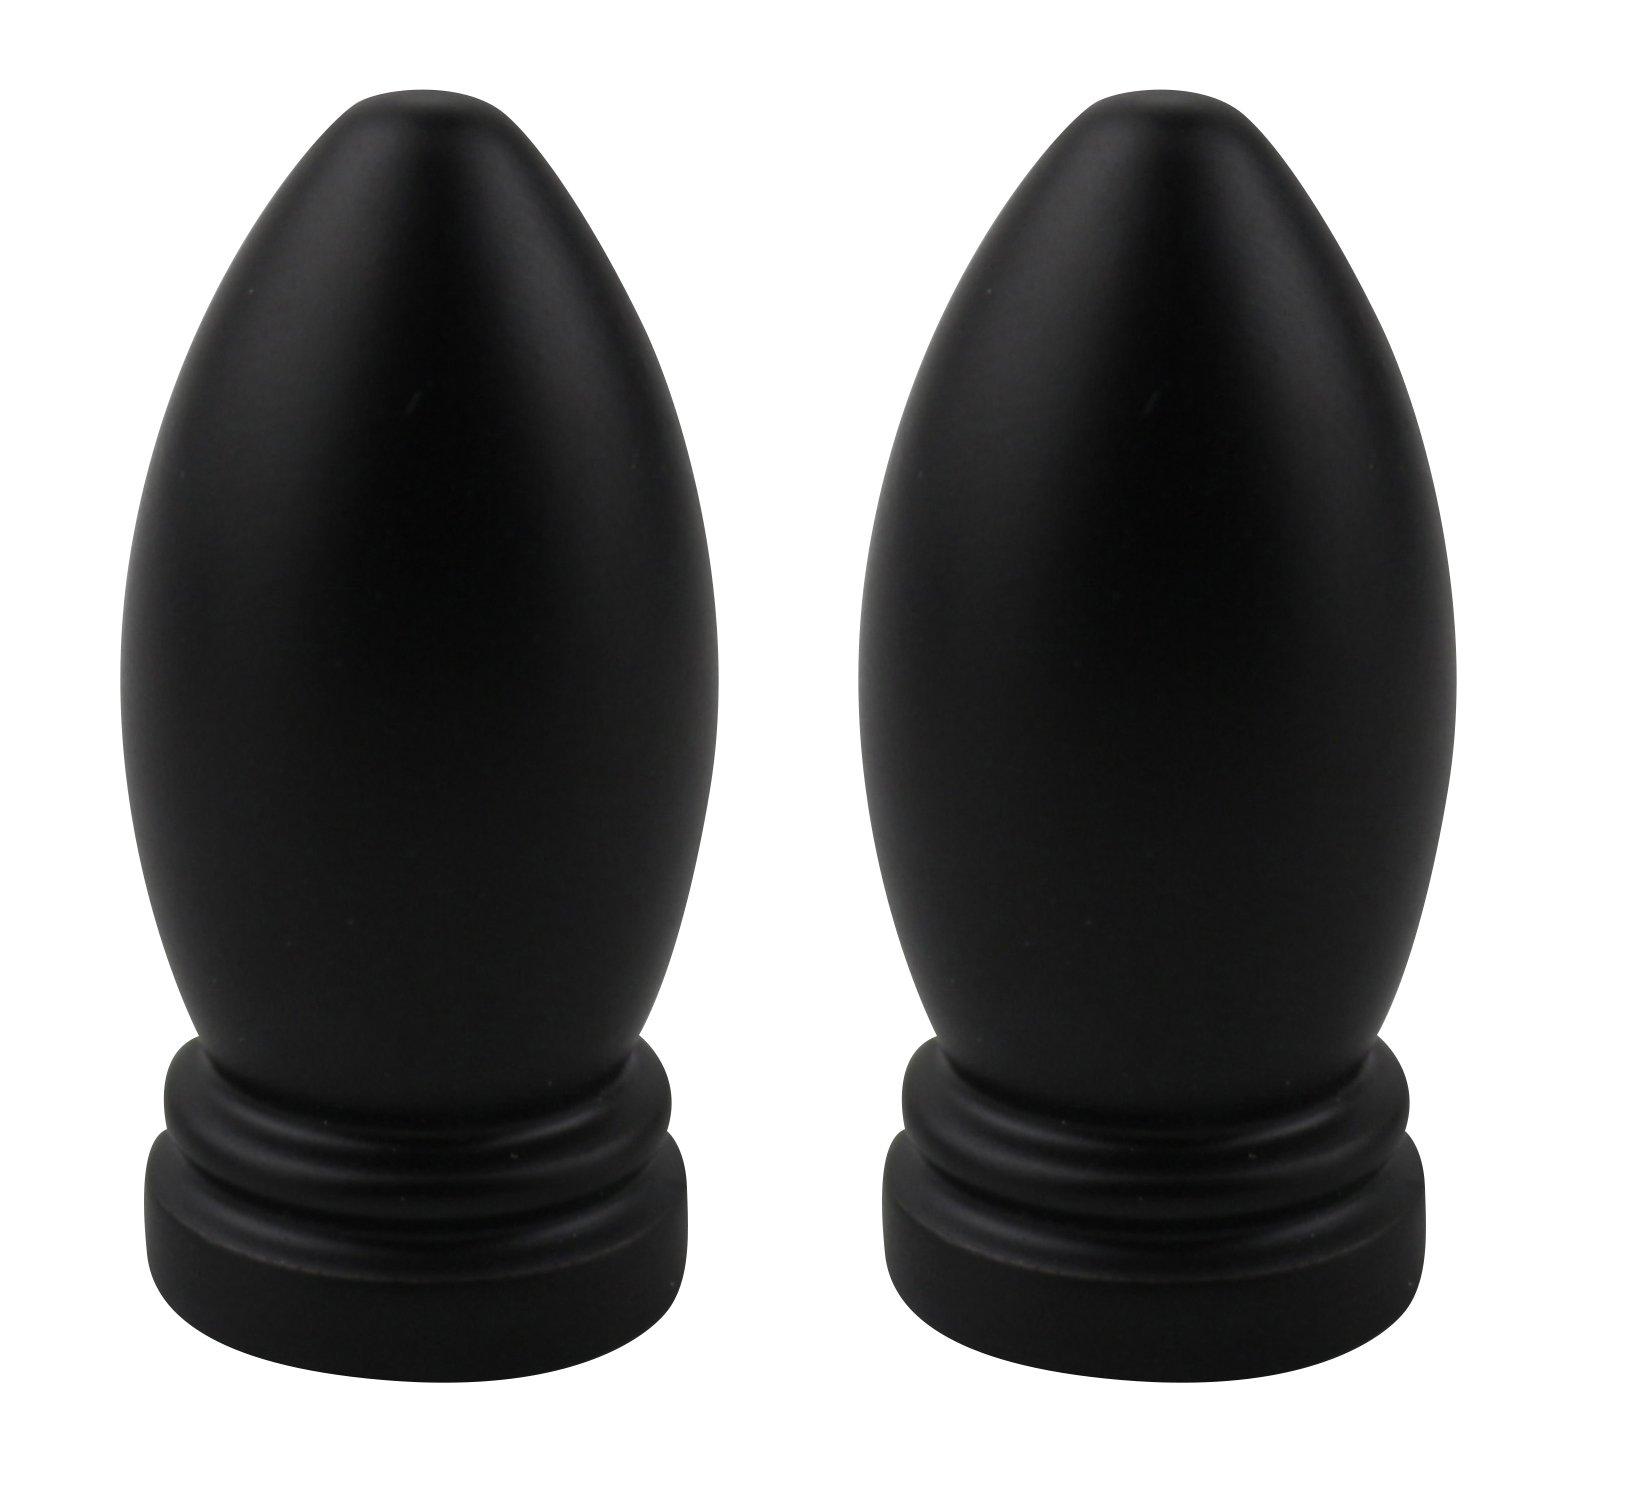 Urbanest Set of 2 Bolton Lamp Finial, 1 3/8-inch Tall, Black